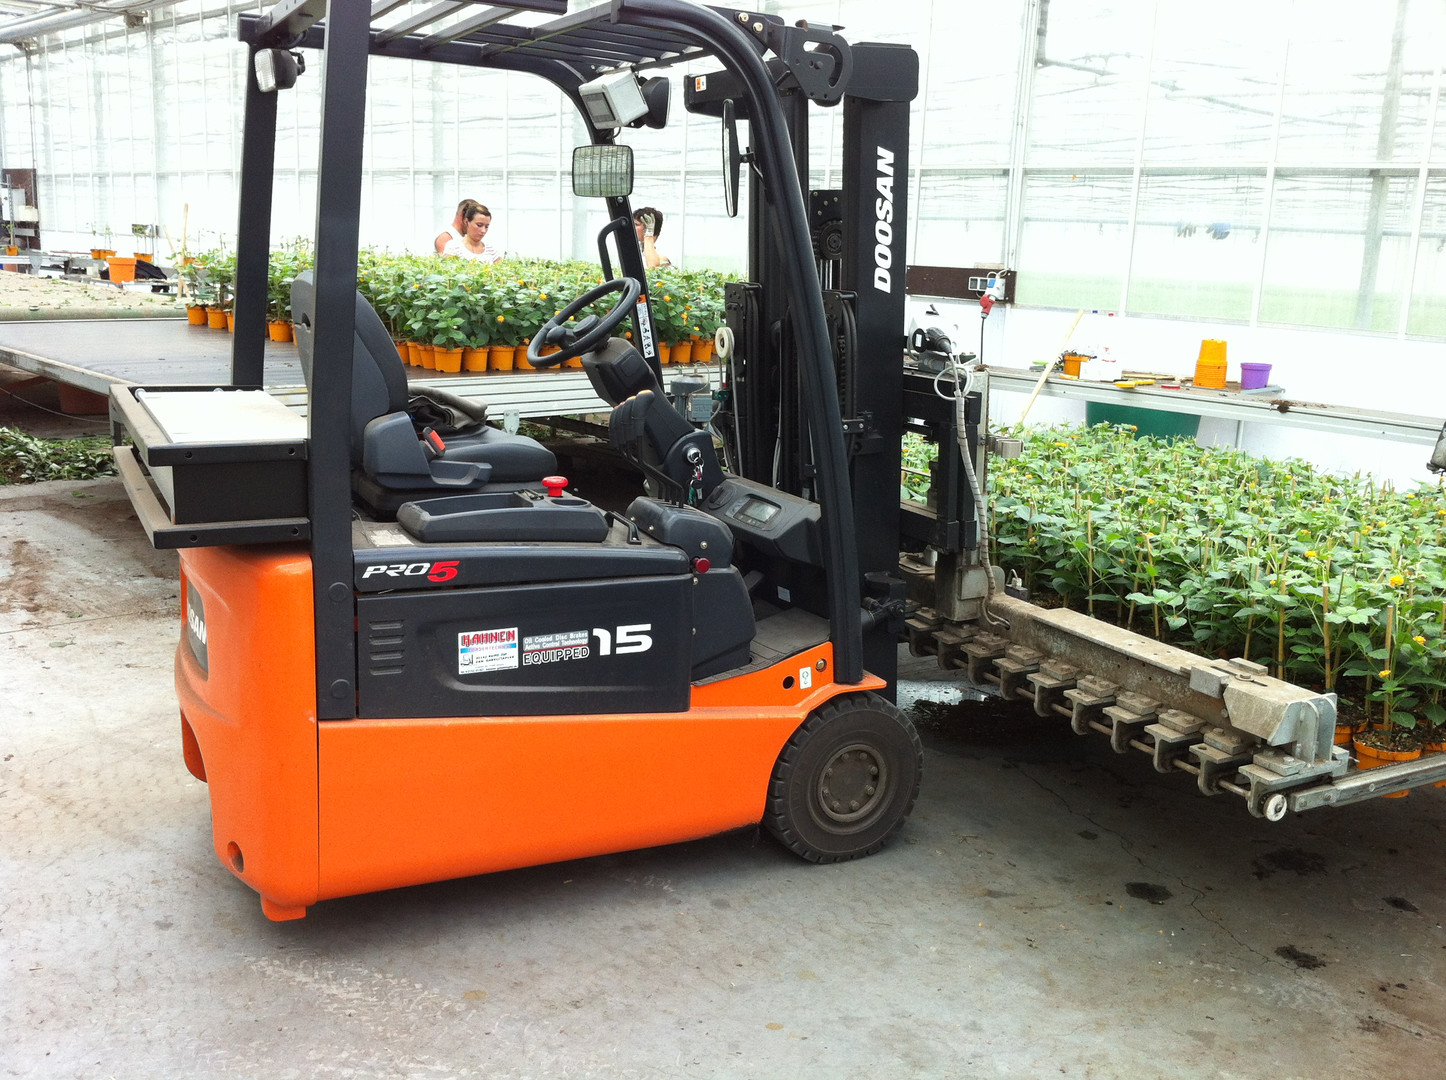 Ideal für den Gartenbau - Visser-Anbaugerät am Doosan Elektro-Gabelstapler - Hahnen